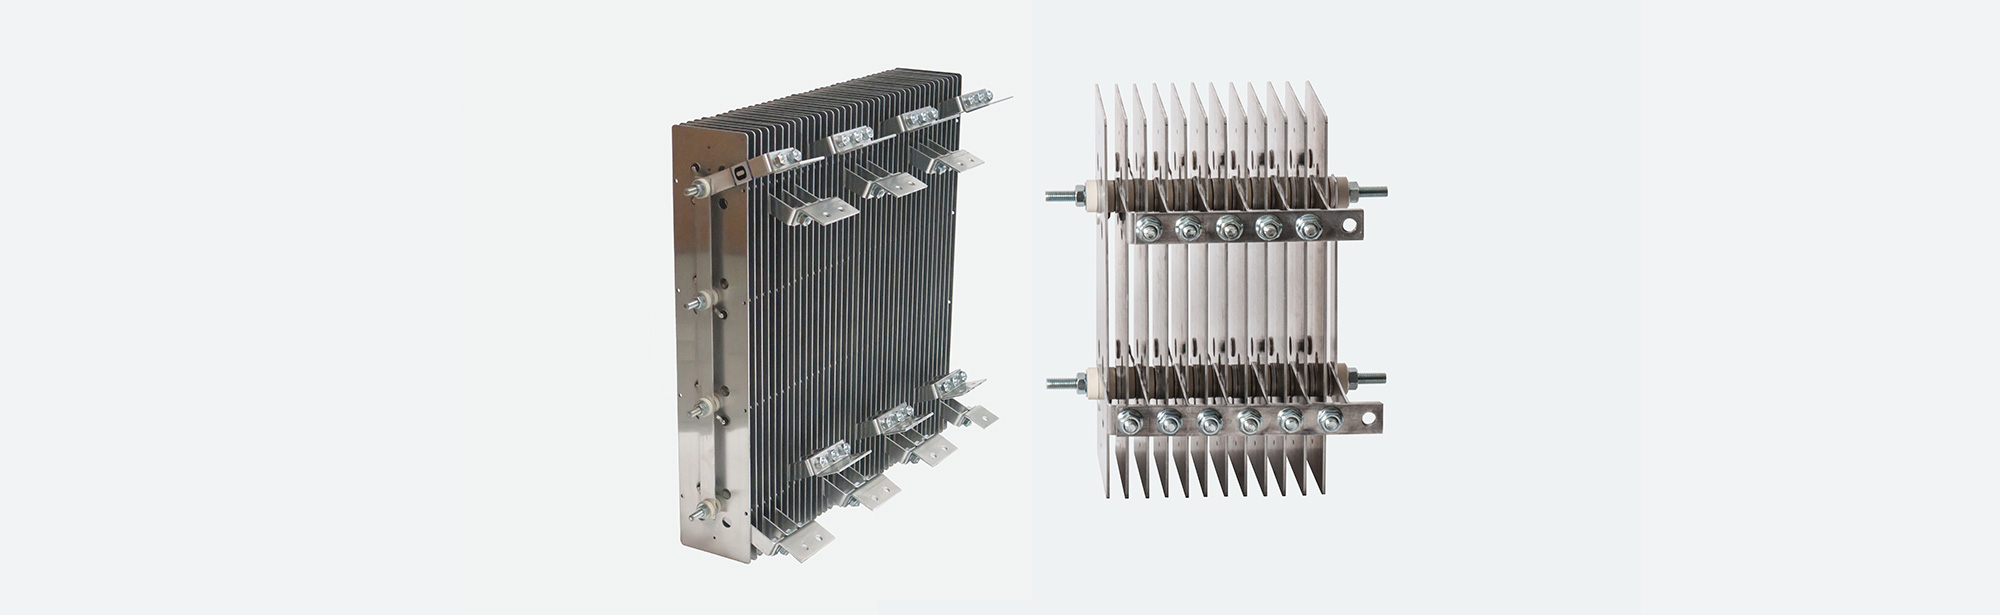 custom-modules